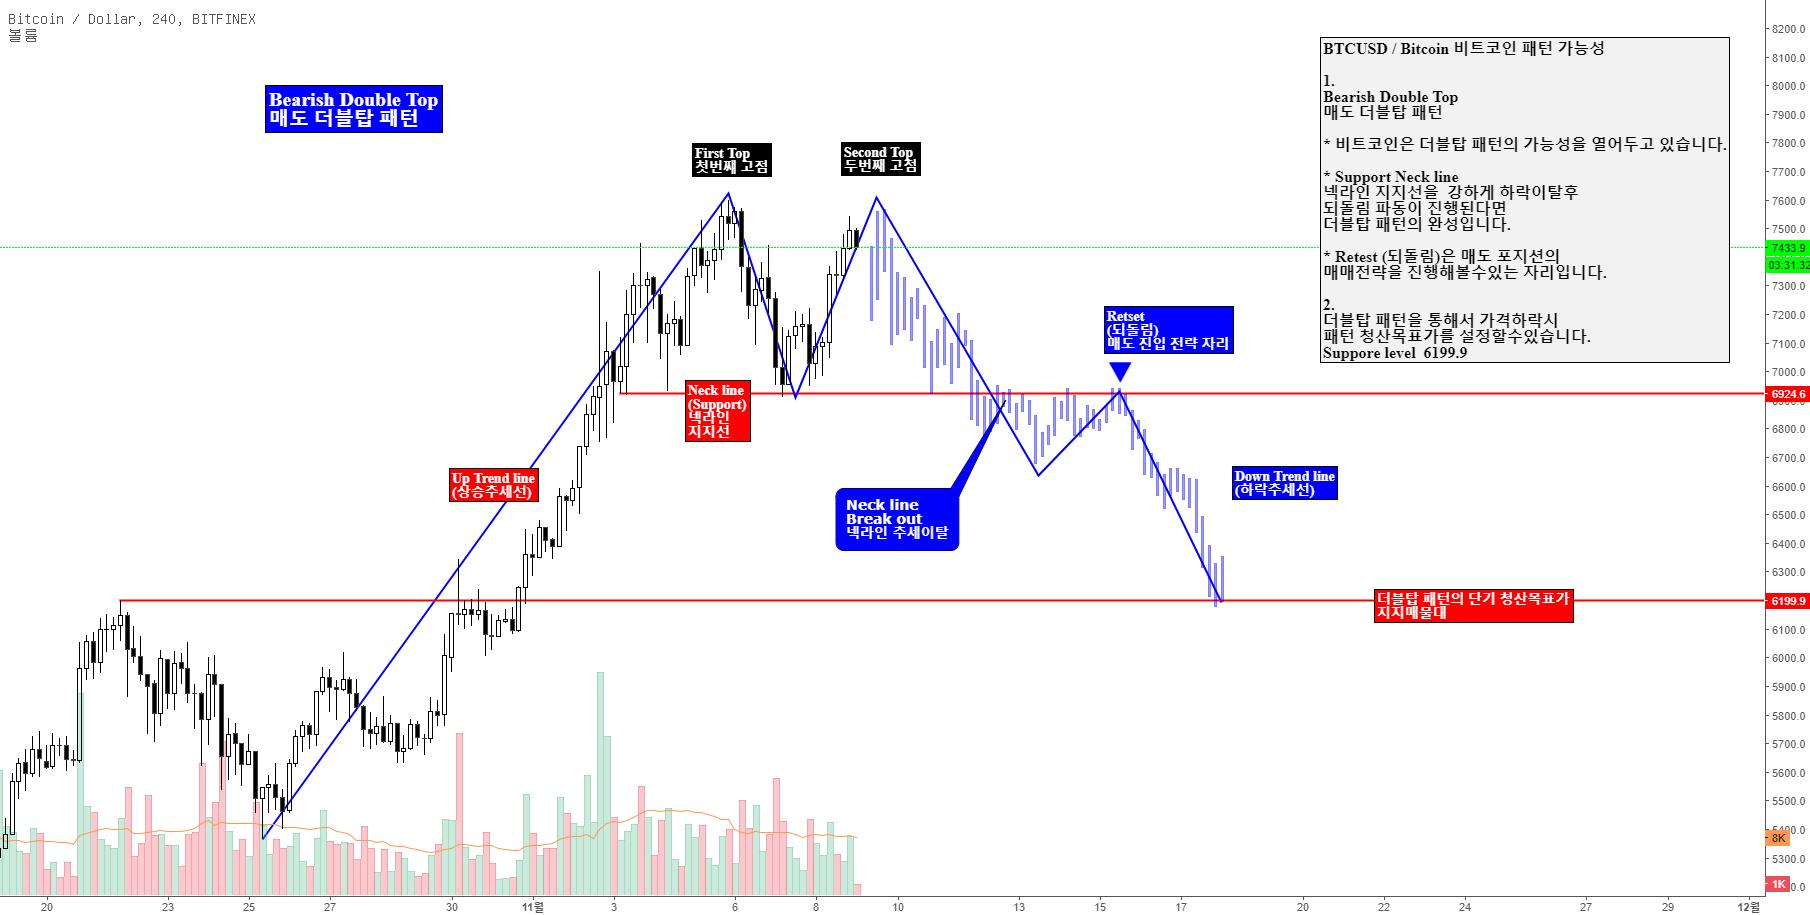 BTCUSD /Bitcoin 비트코인 더블탑 패턴 가능성 Bearish Double Top Pattern